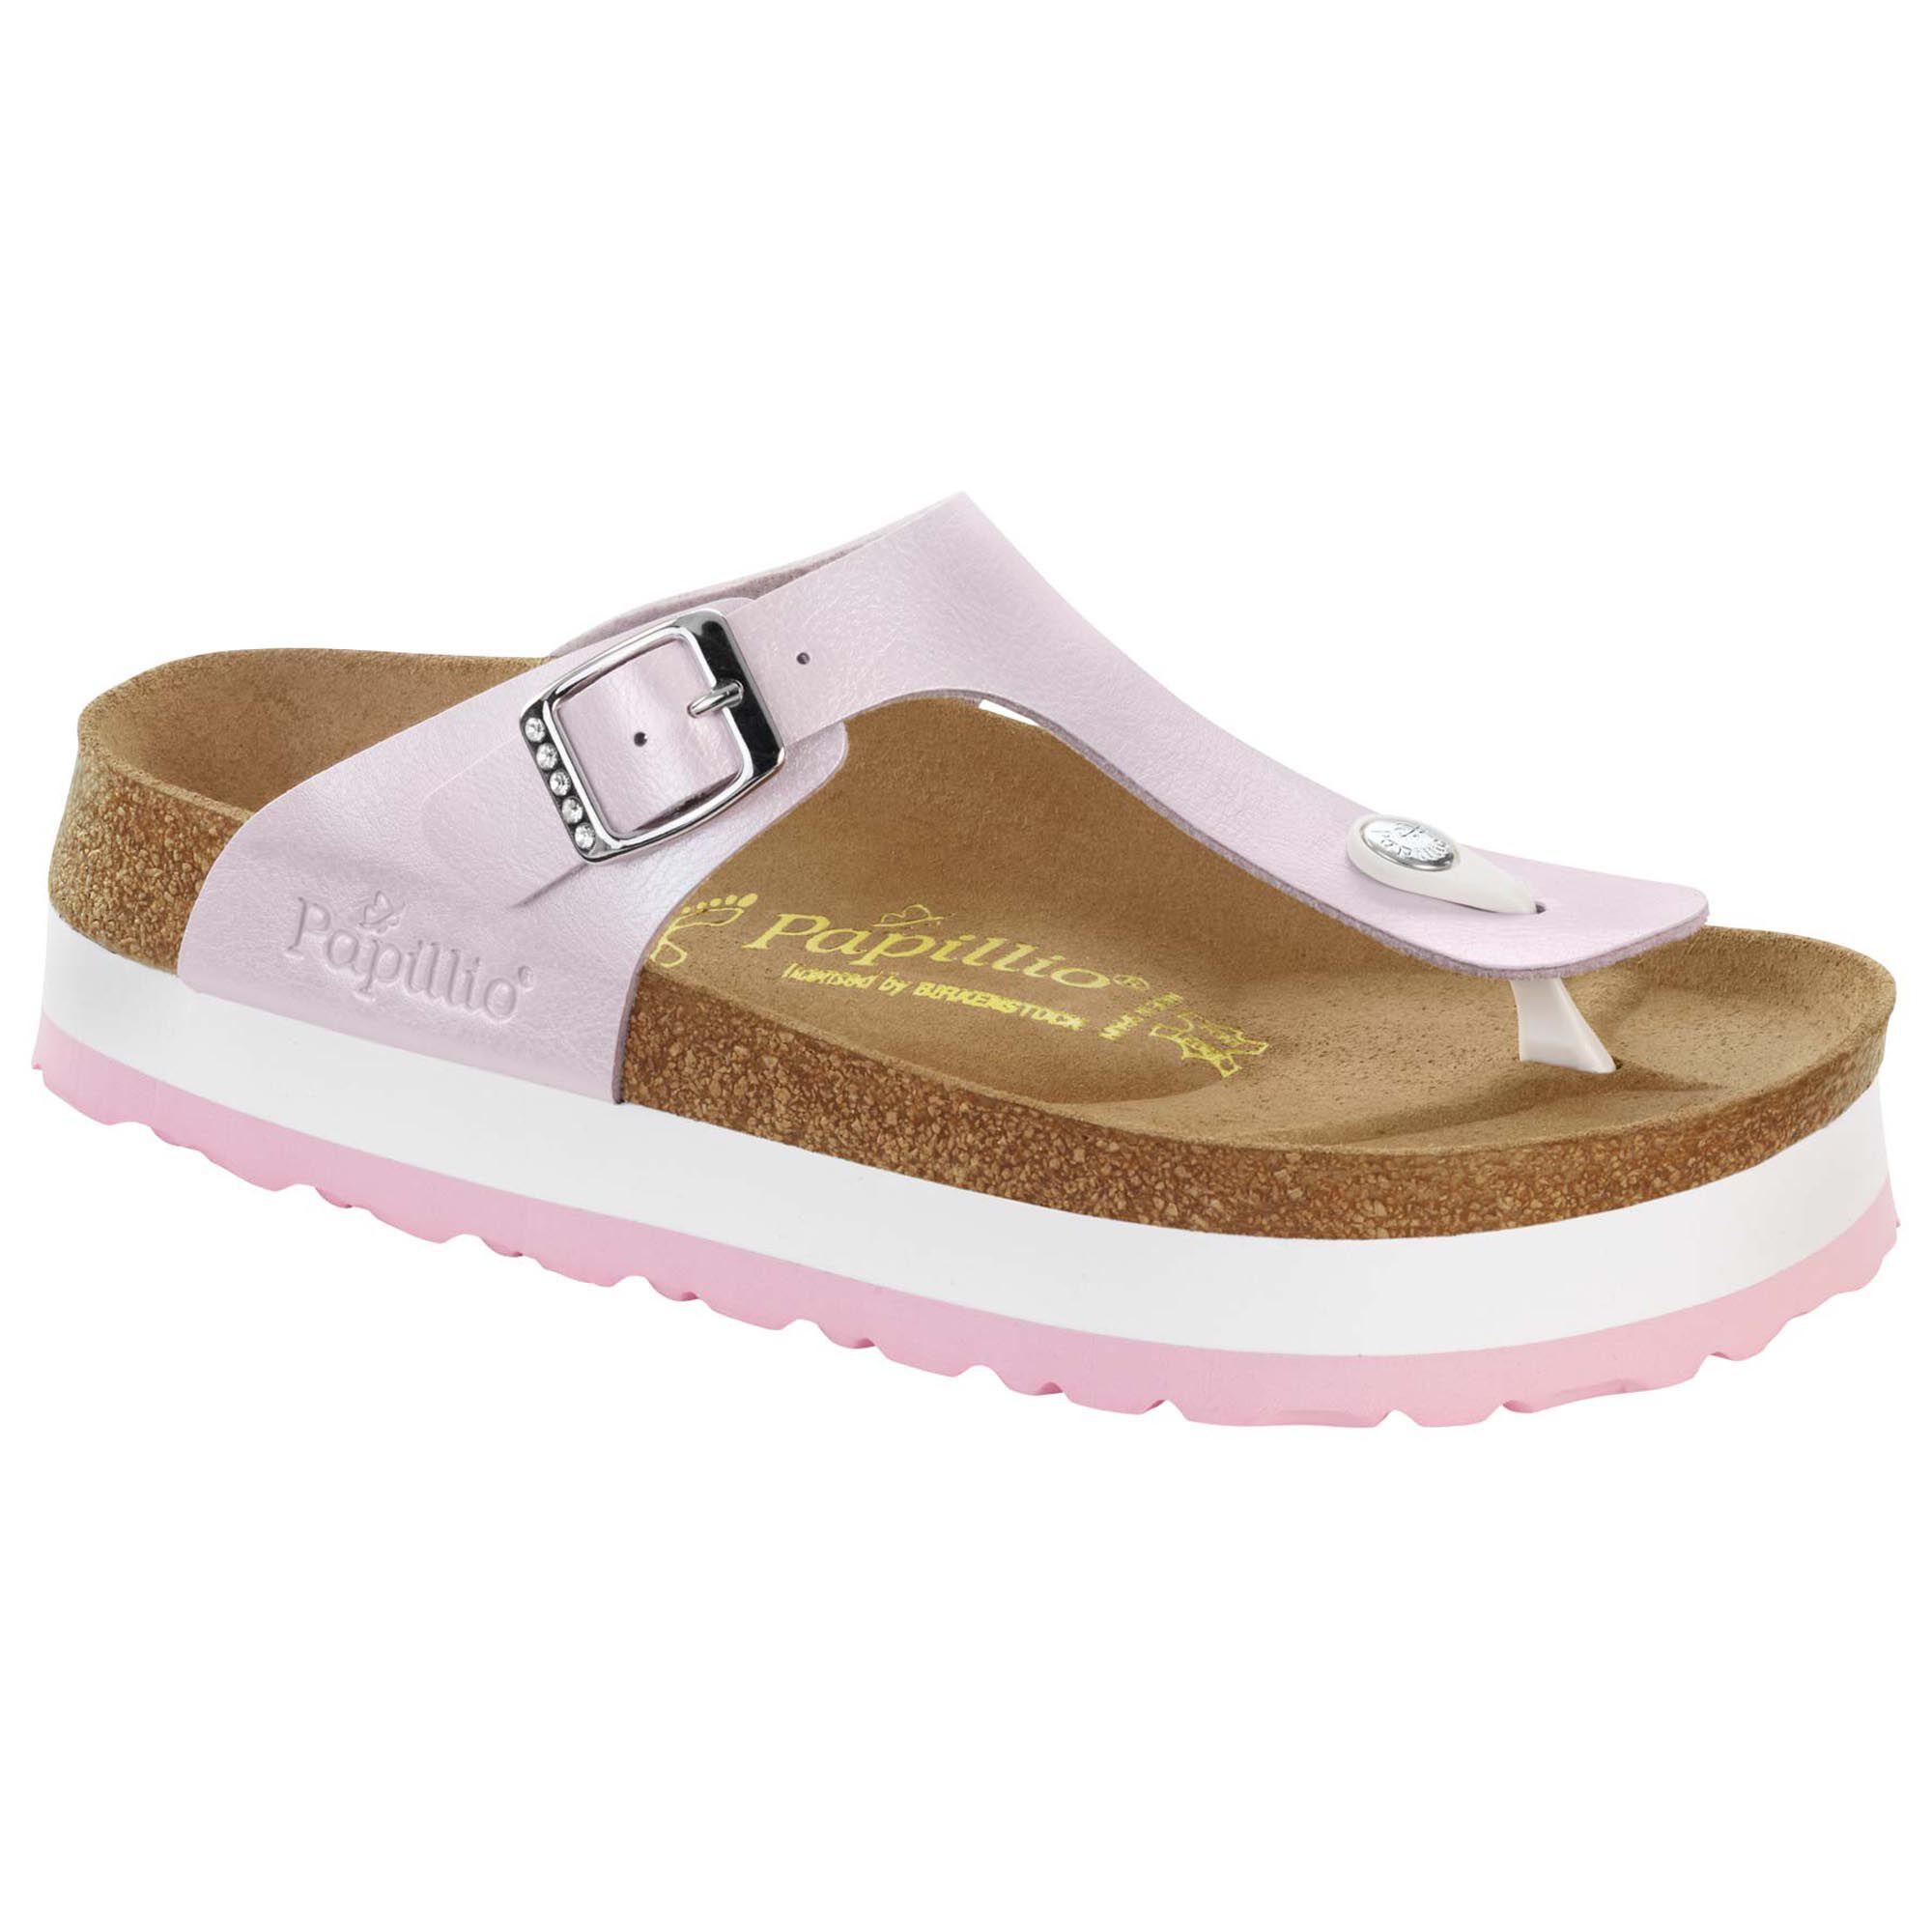 Birkenstock Papillio Gizeh infradito sandalo BirkoFlor Scarpe da donna